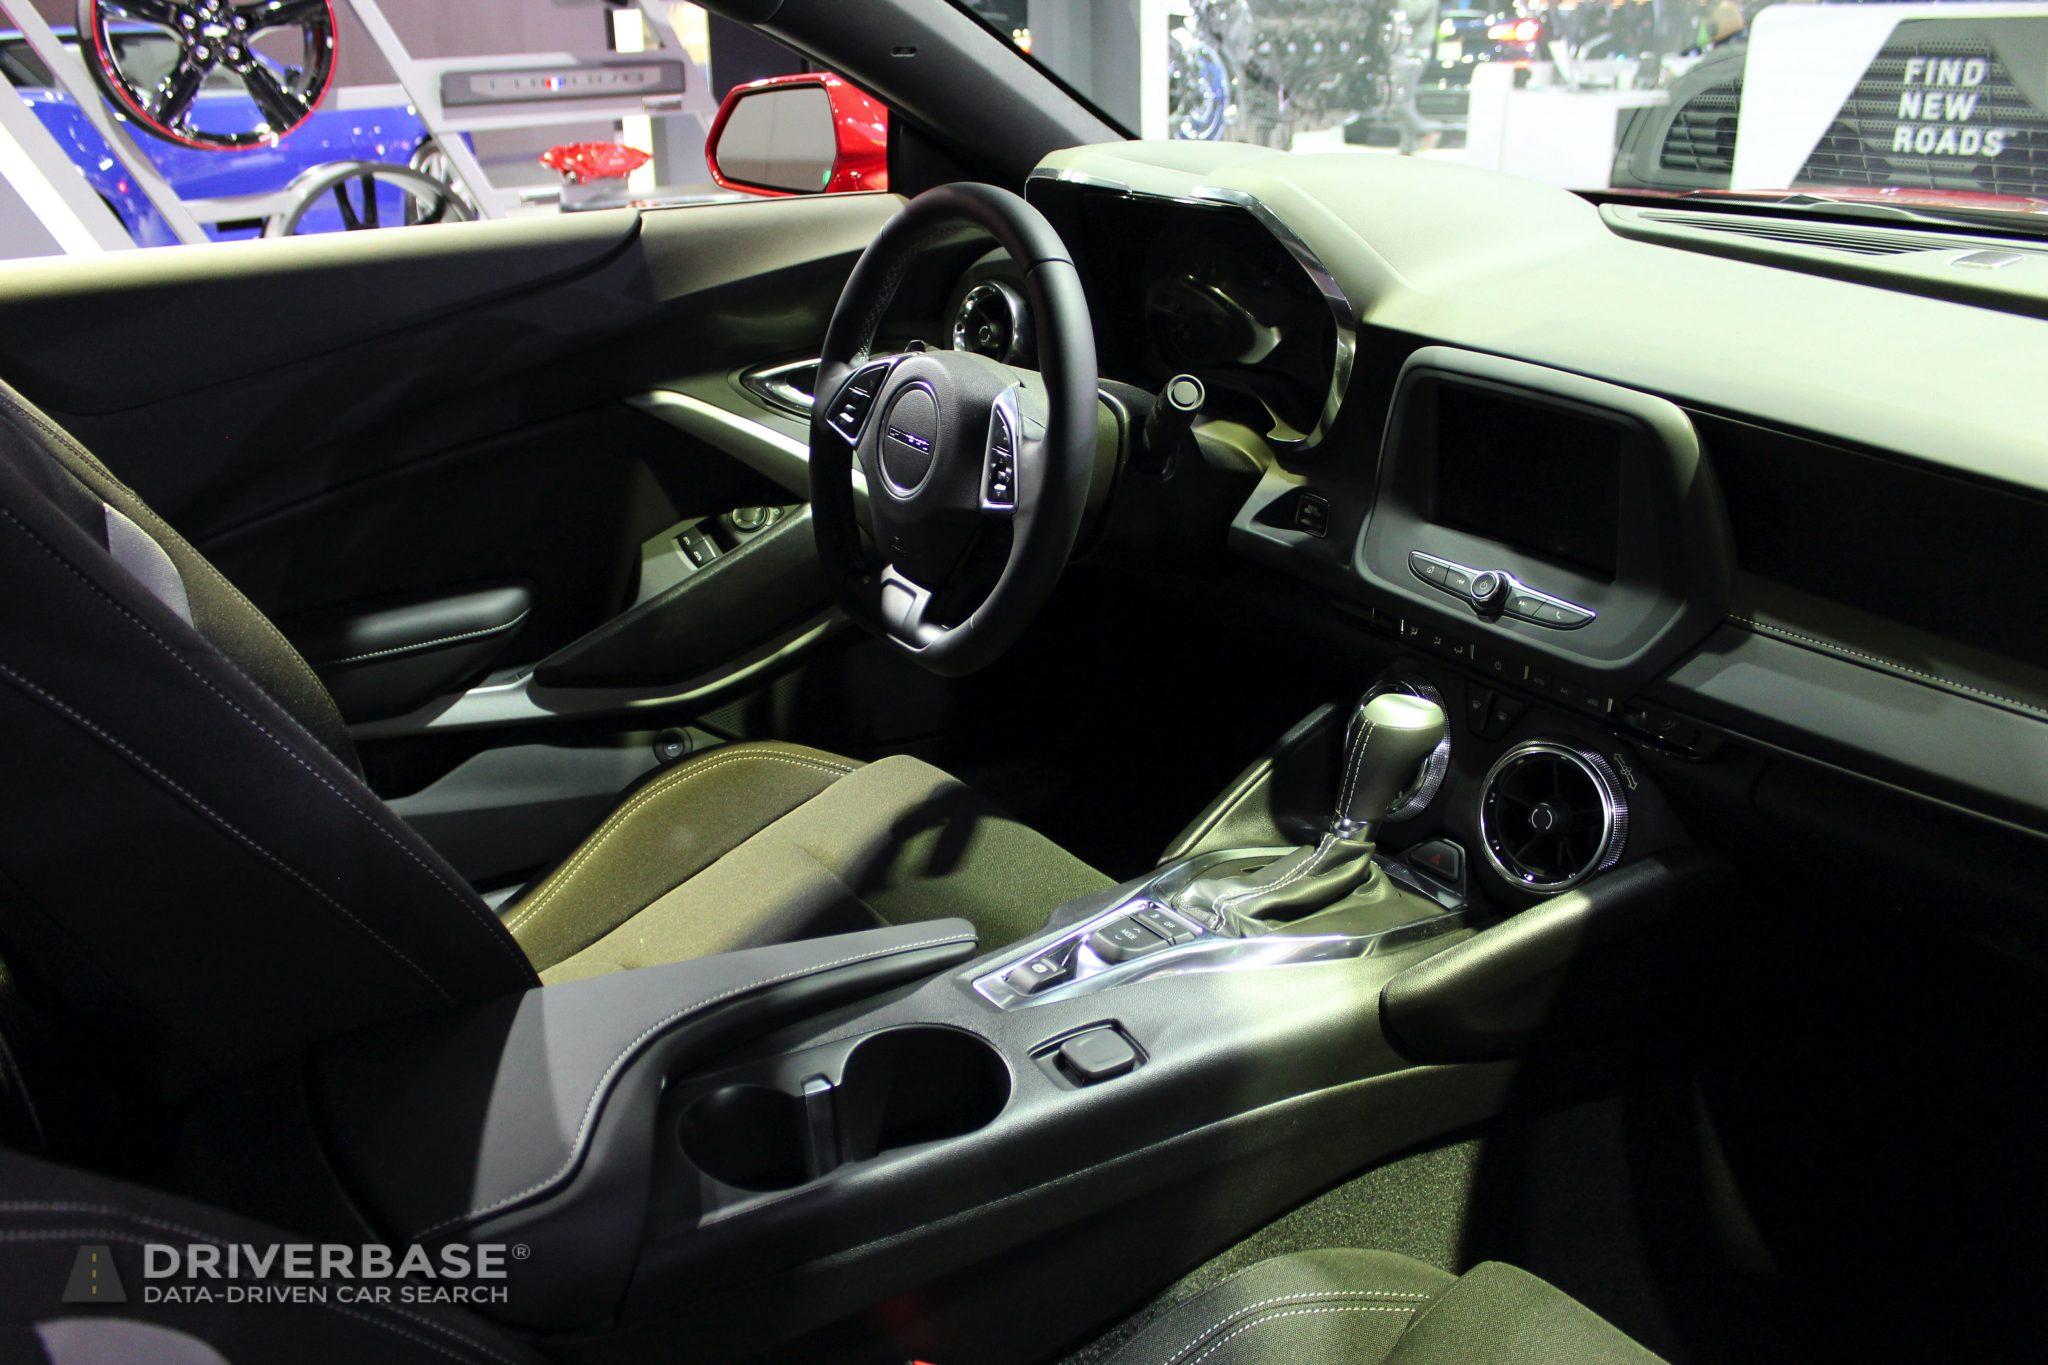 2020 Chevrolet Camaro LT1 at the 2019 Los Angeles Auto Show